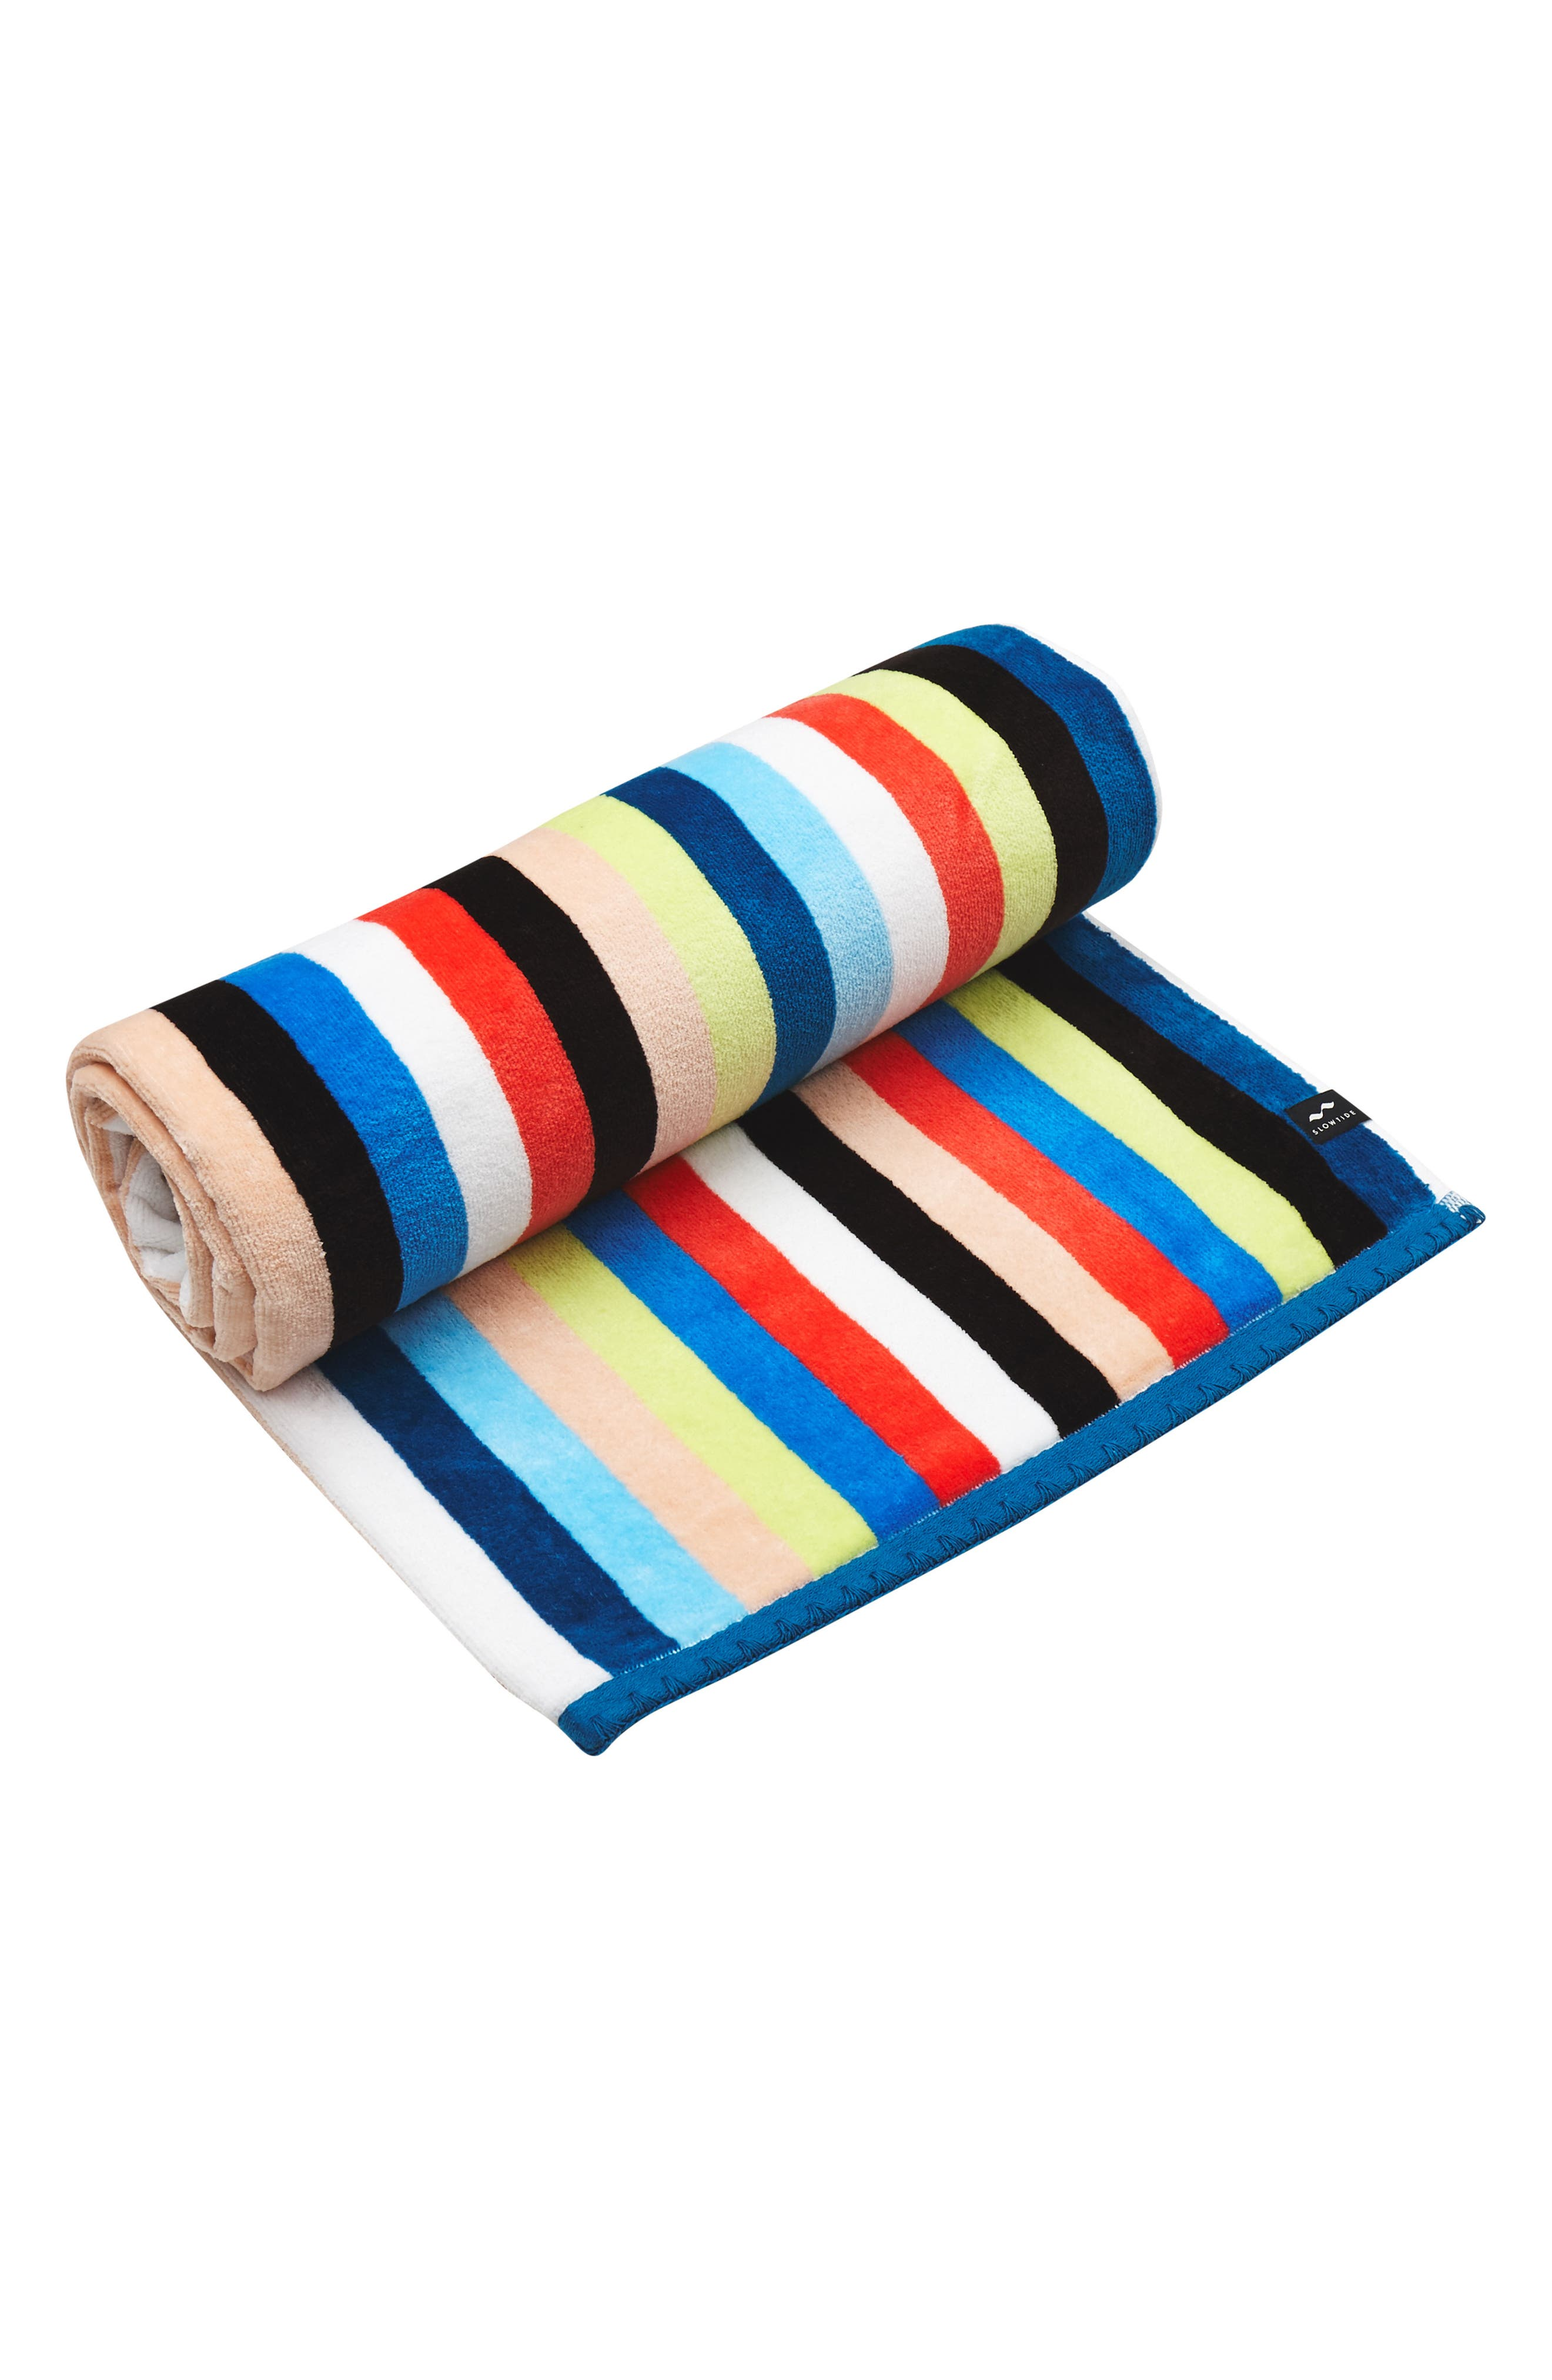 Versa Beach Towel,                             Alternate thumbnail 2, color,                             Blue Multi